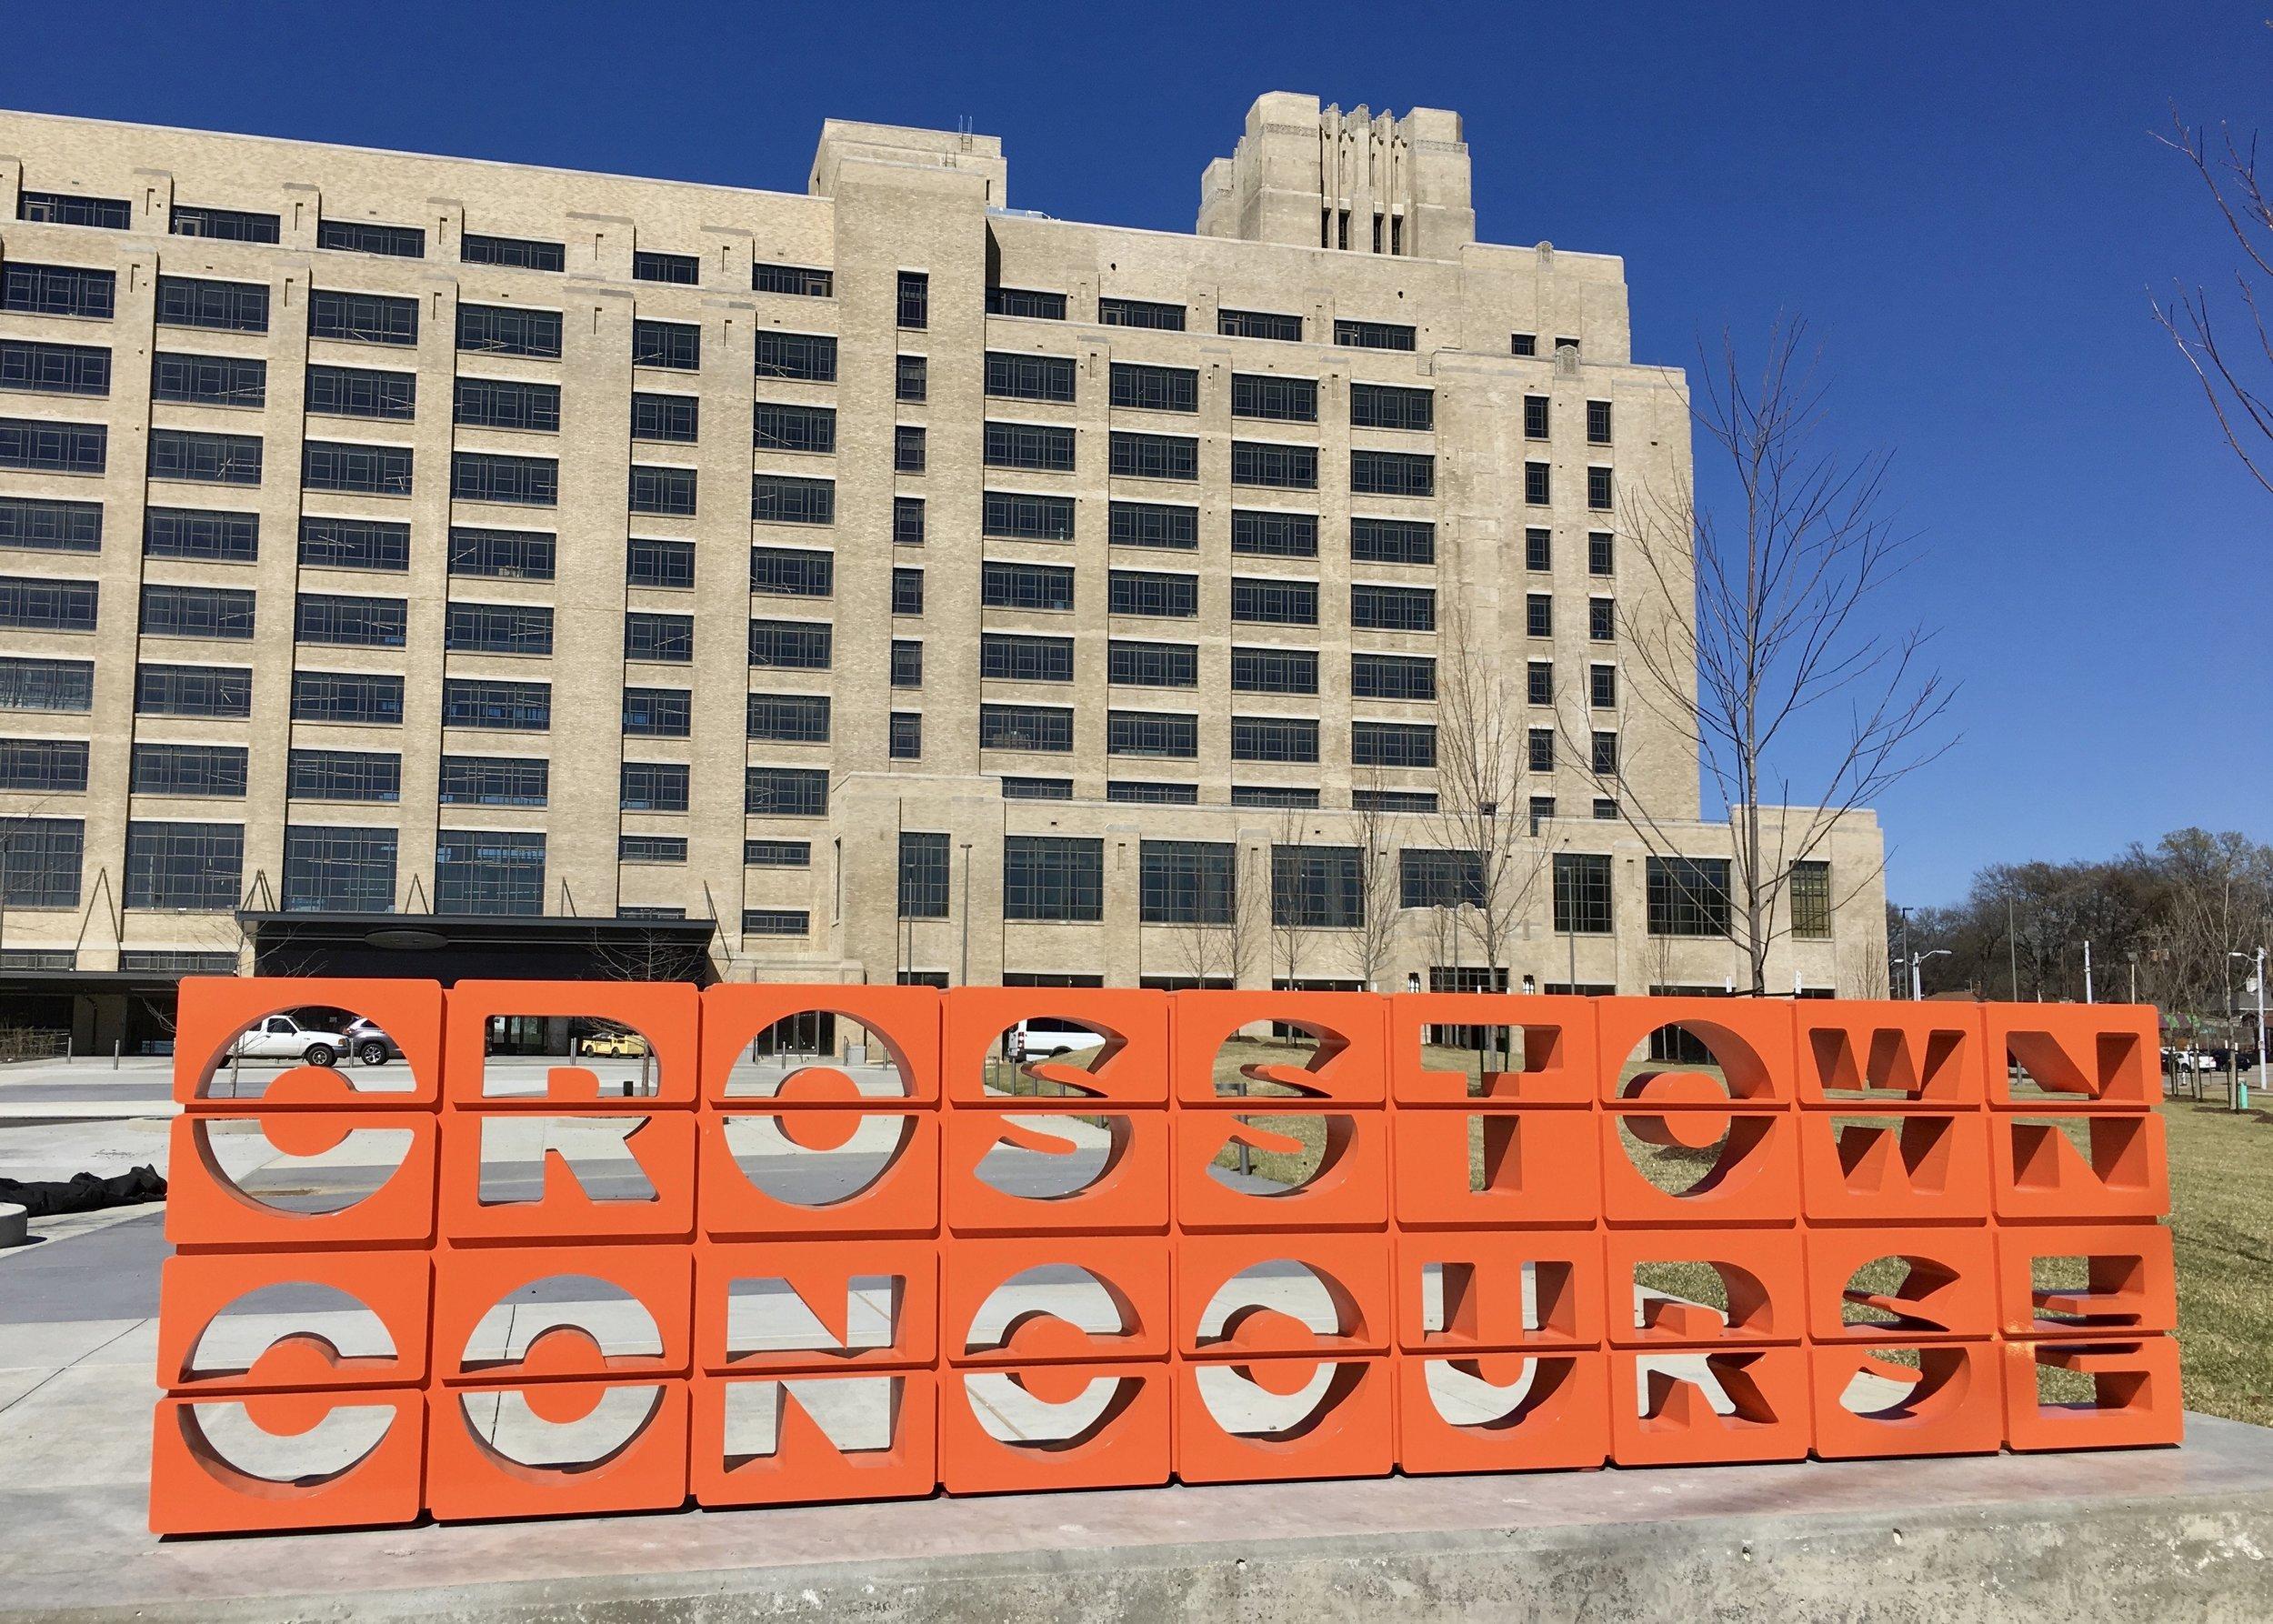 Crosstonw-Concourse-Street-Sign.jpg